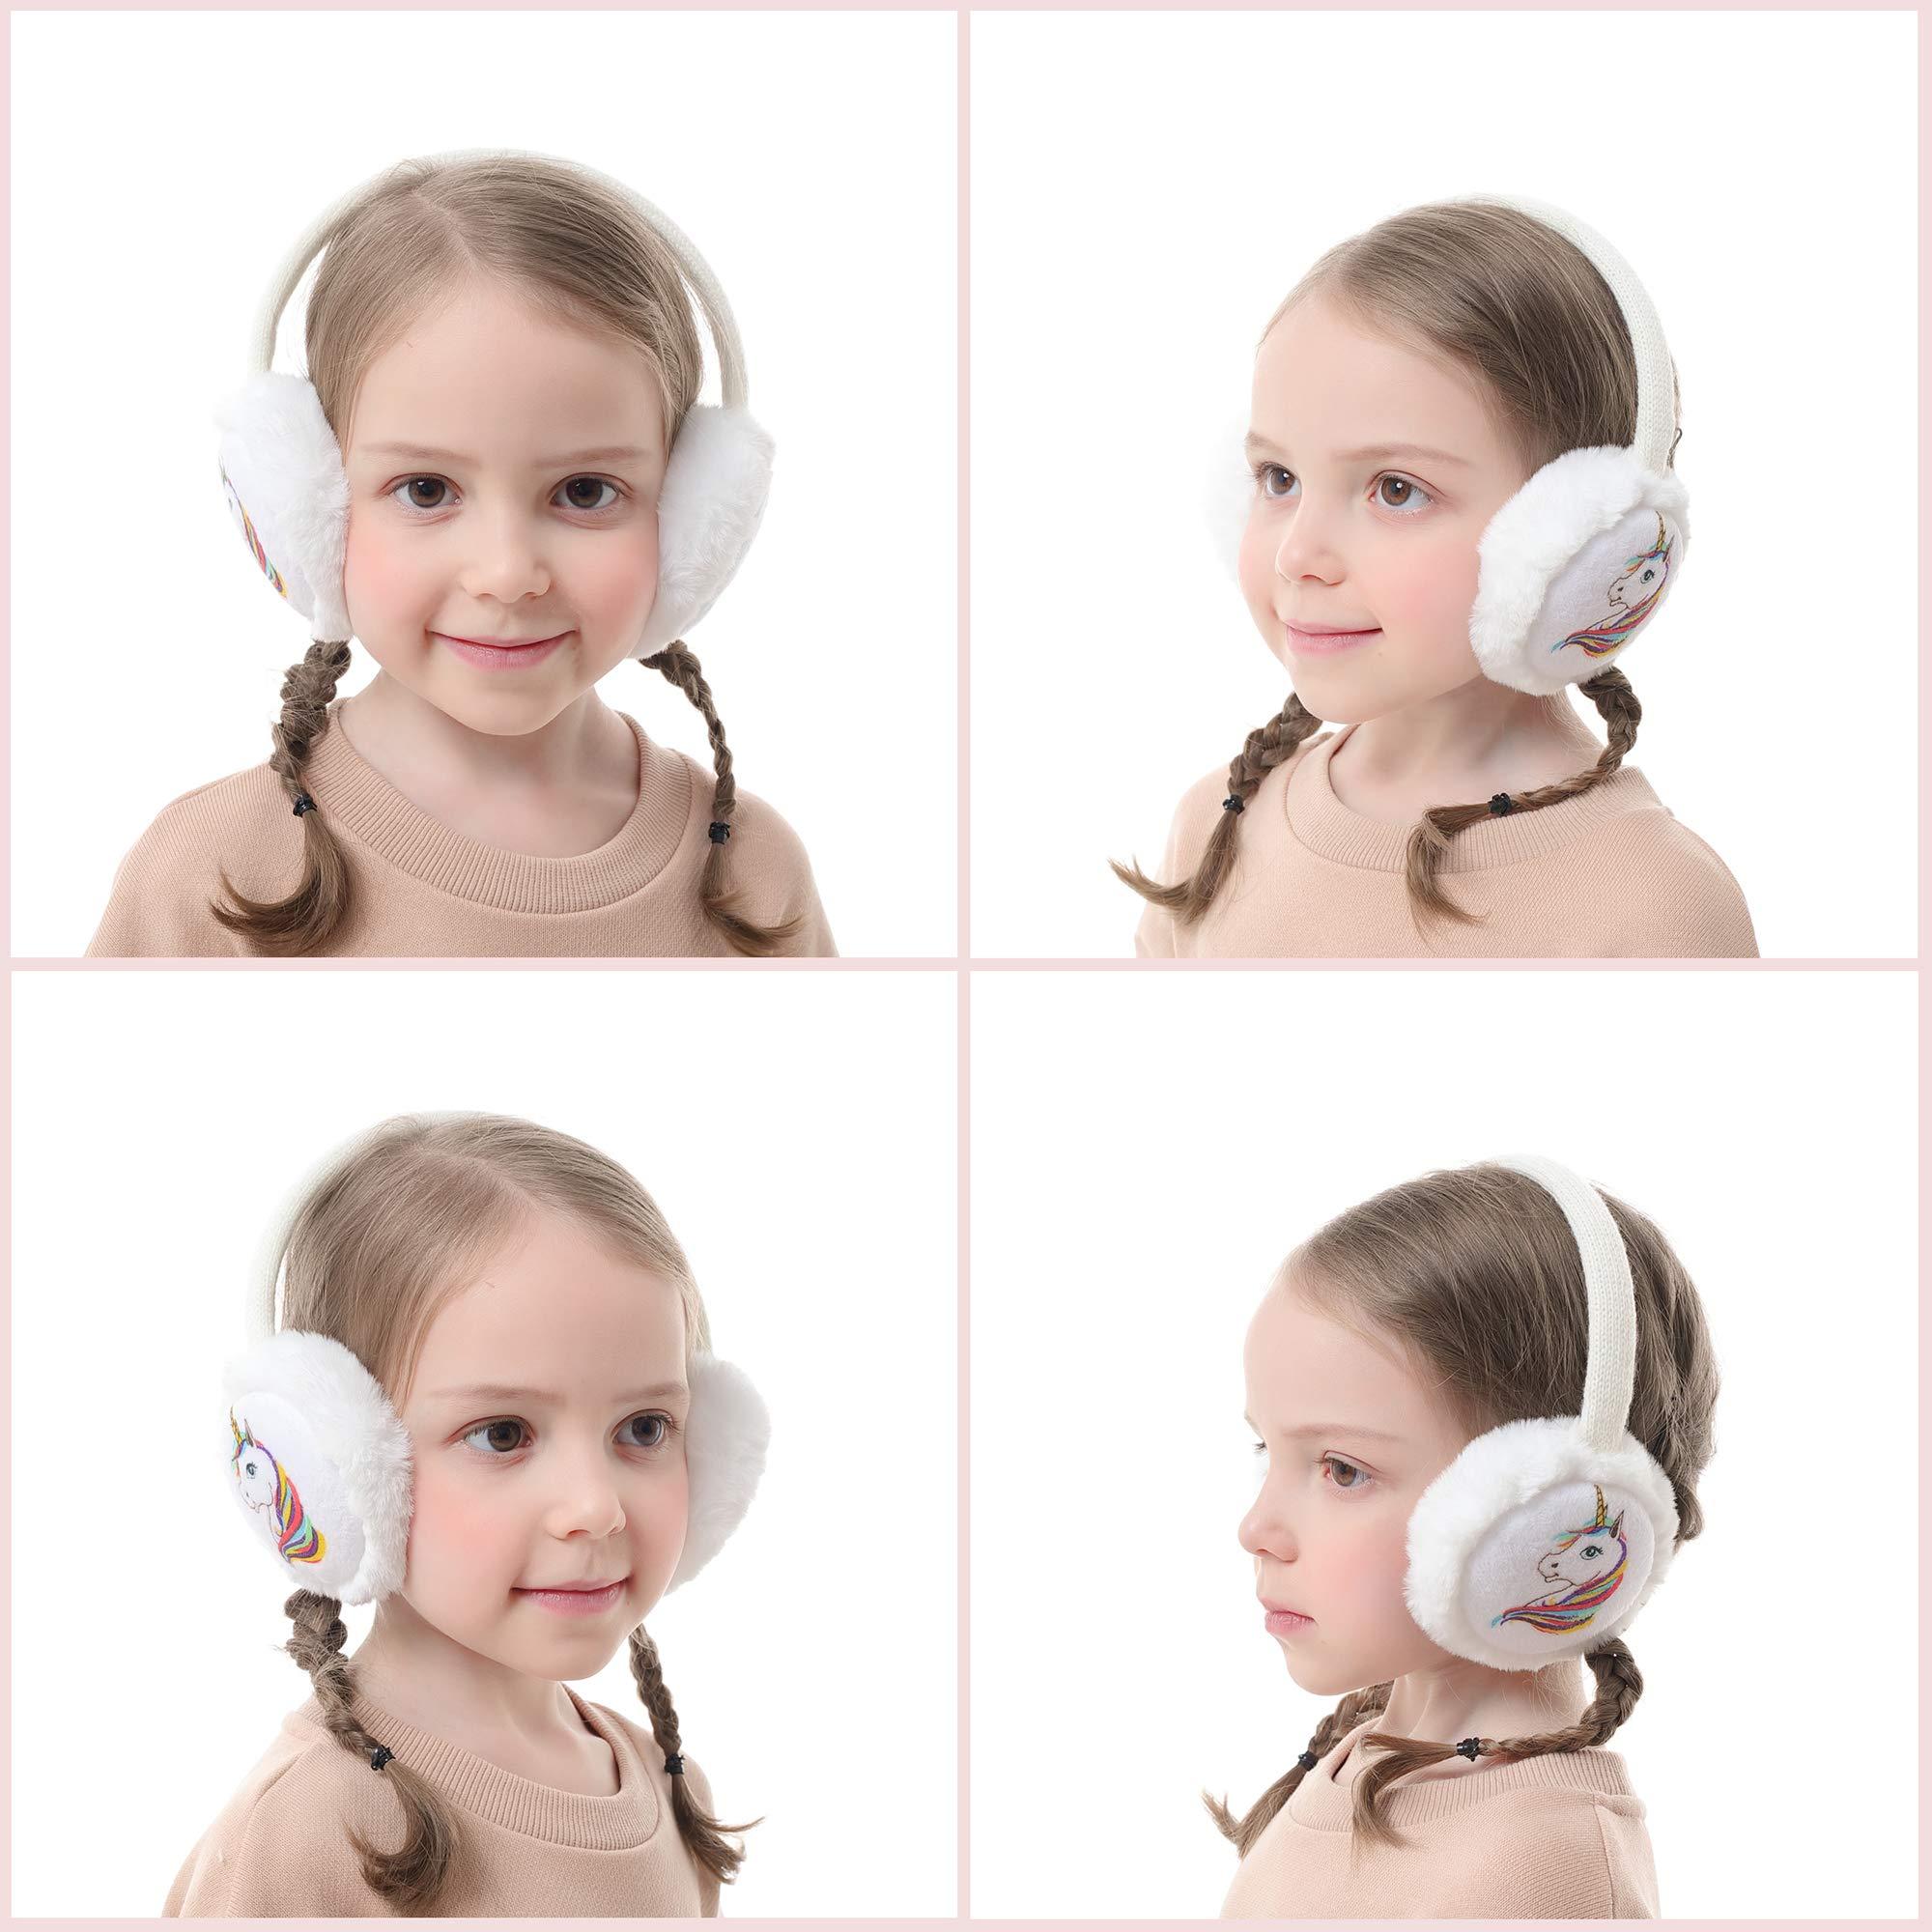 Flammi Kids Girls Winter Unicorn Earmuffs Scarf Neck Warmer Set Warm Plush Ear Warmers 3-12 Years